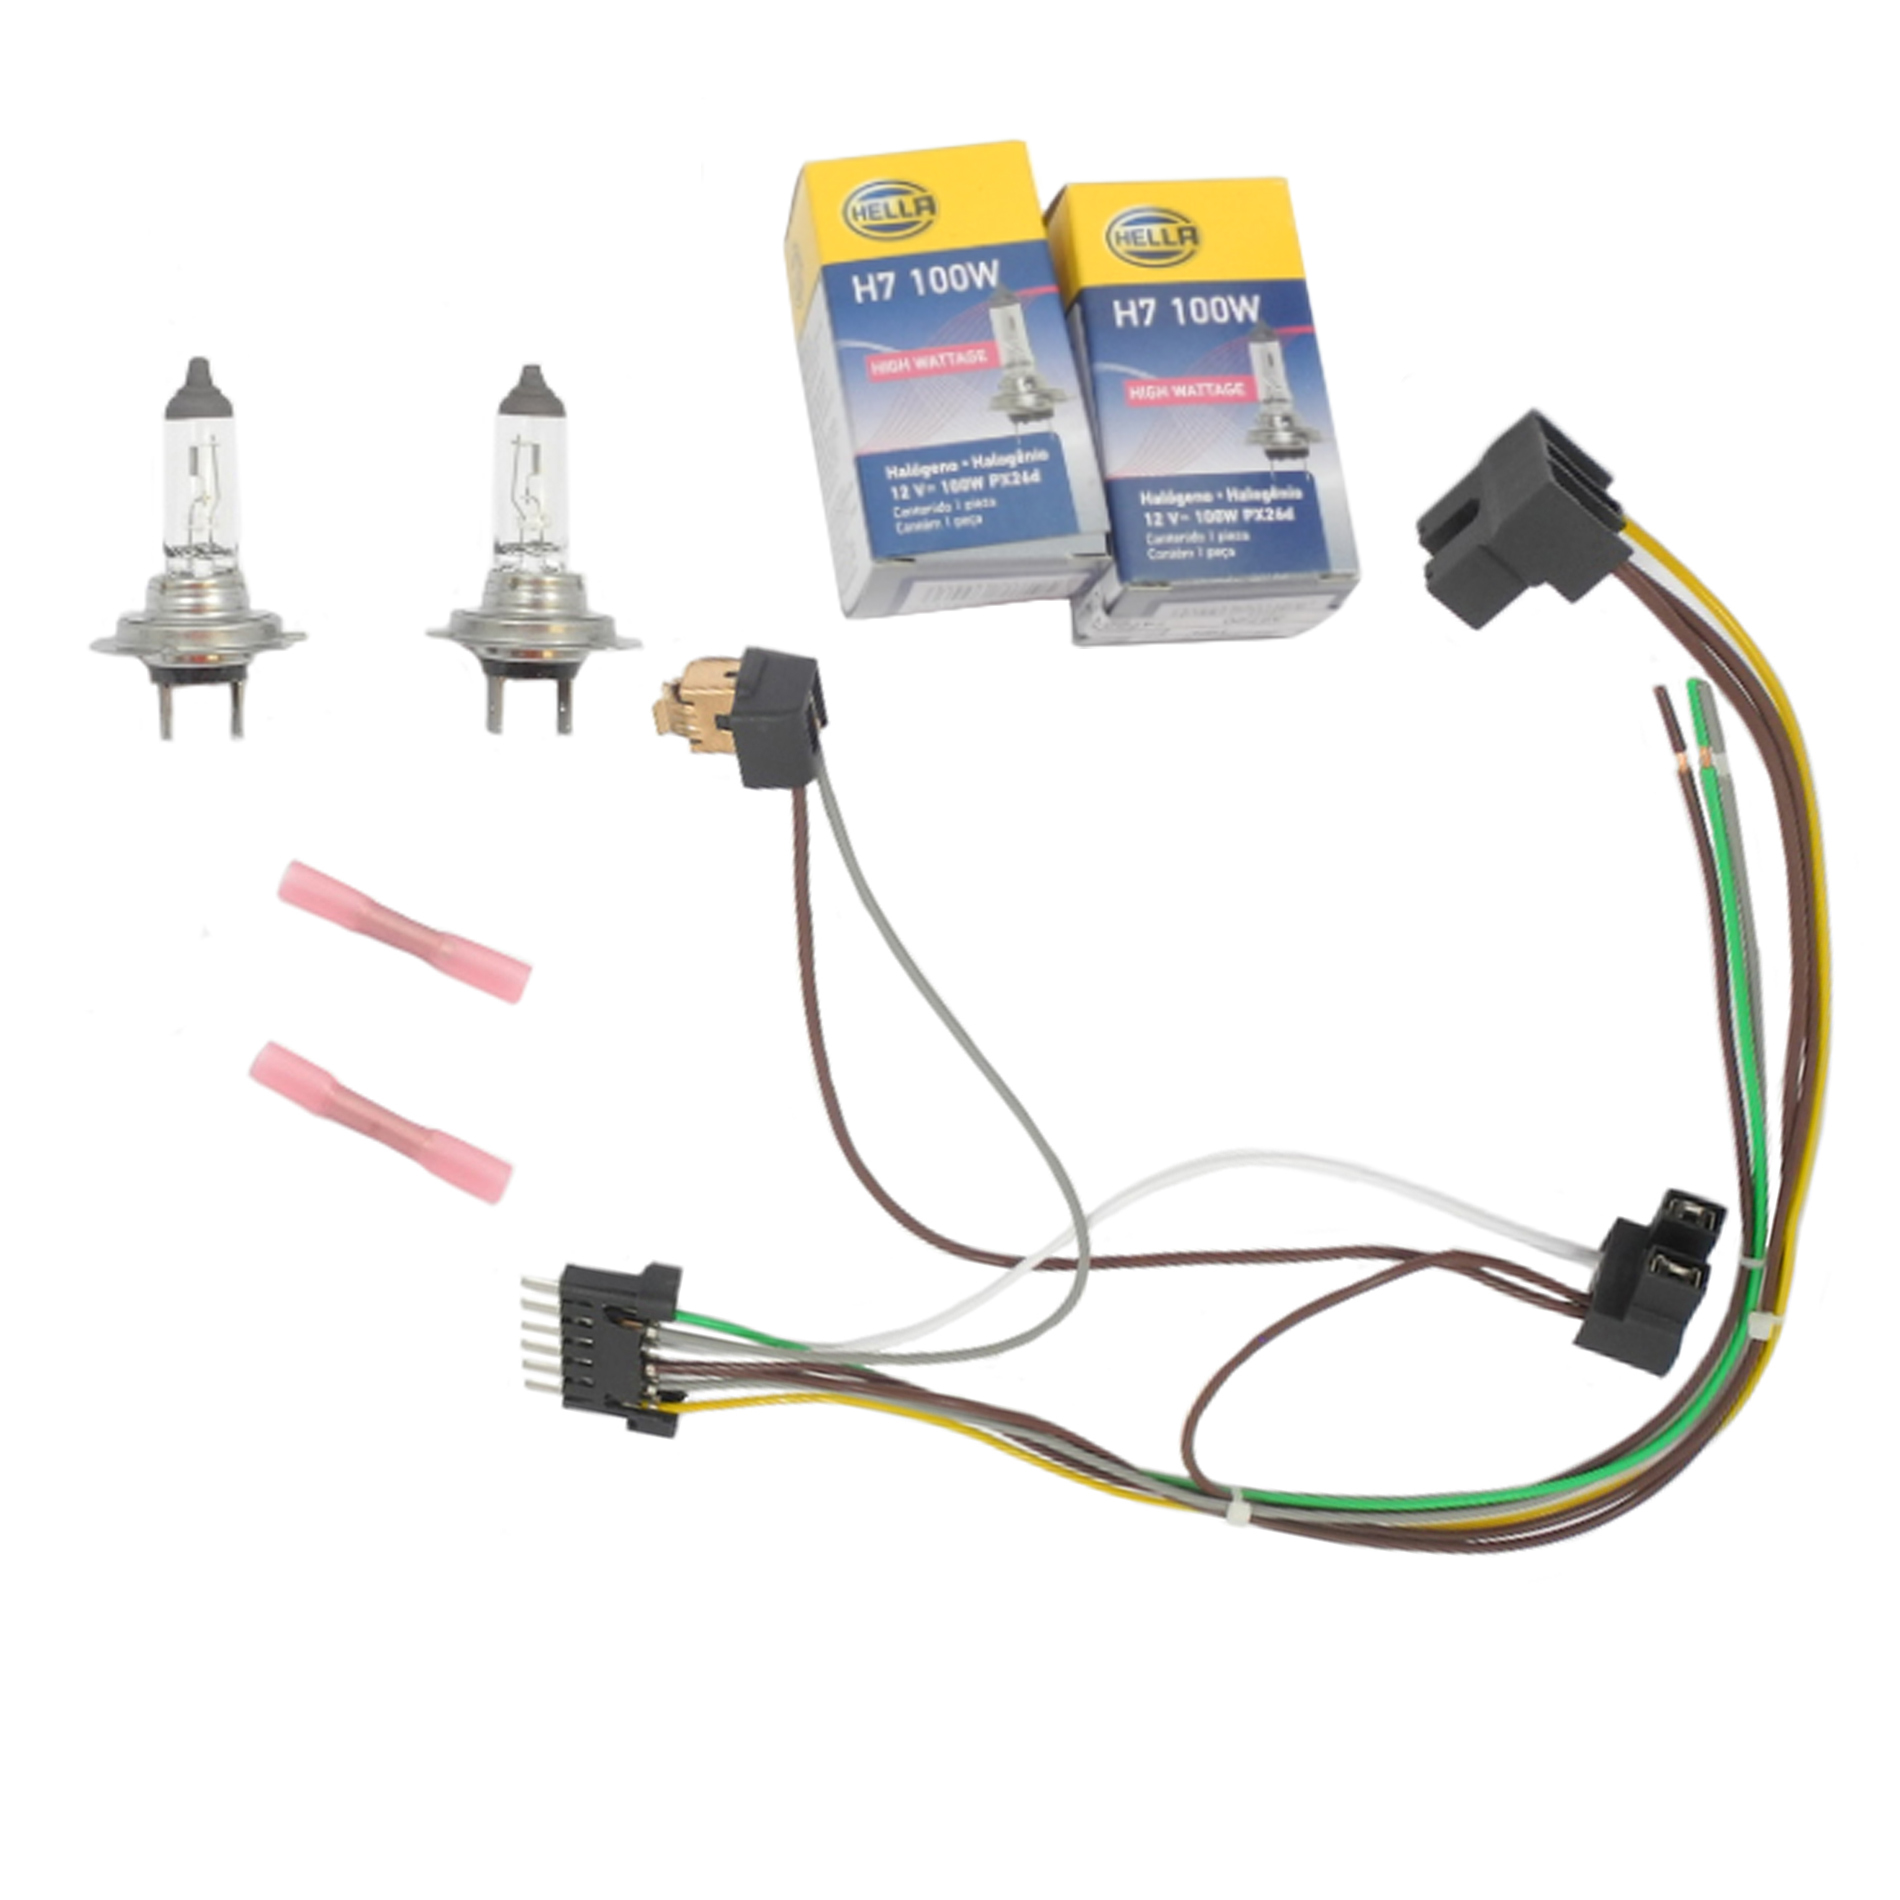 Prime Headlight Wiring Harness H7 100W Headlight Bulb For Benz S55 S600 Wiring Digital Resources Anistprontobusorg